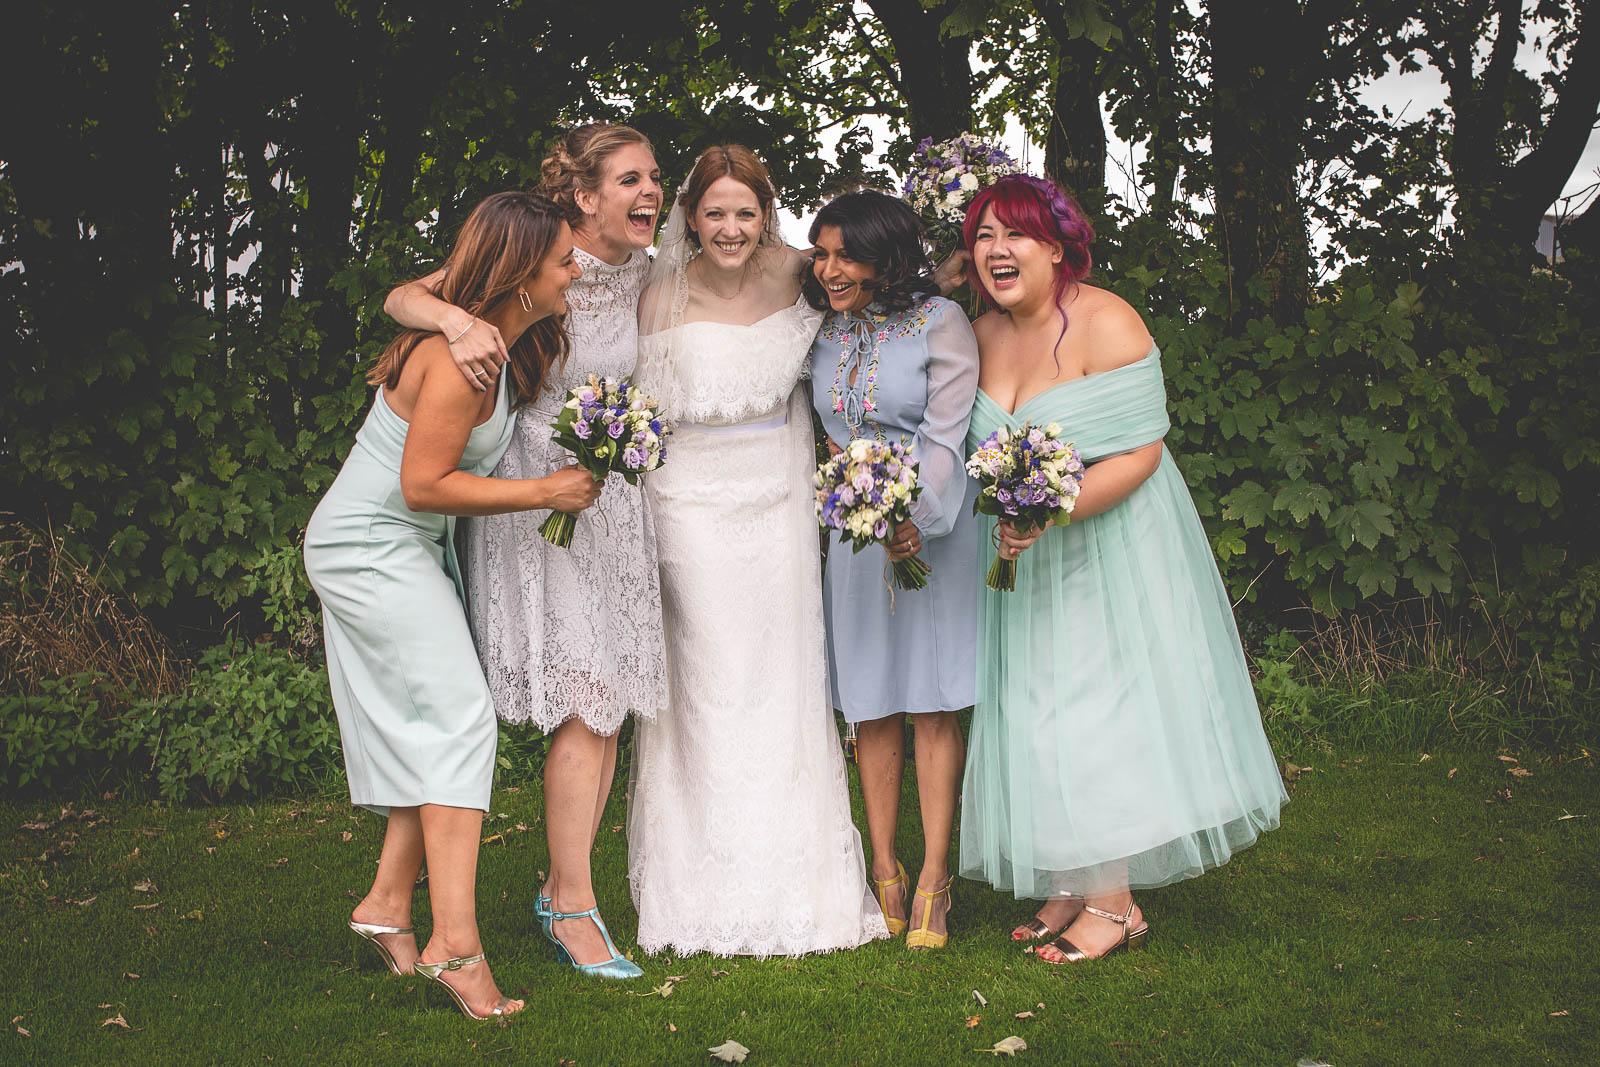 the old barn - clovelly - ugotthelove - wedding photography-8017.jpg